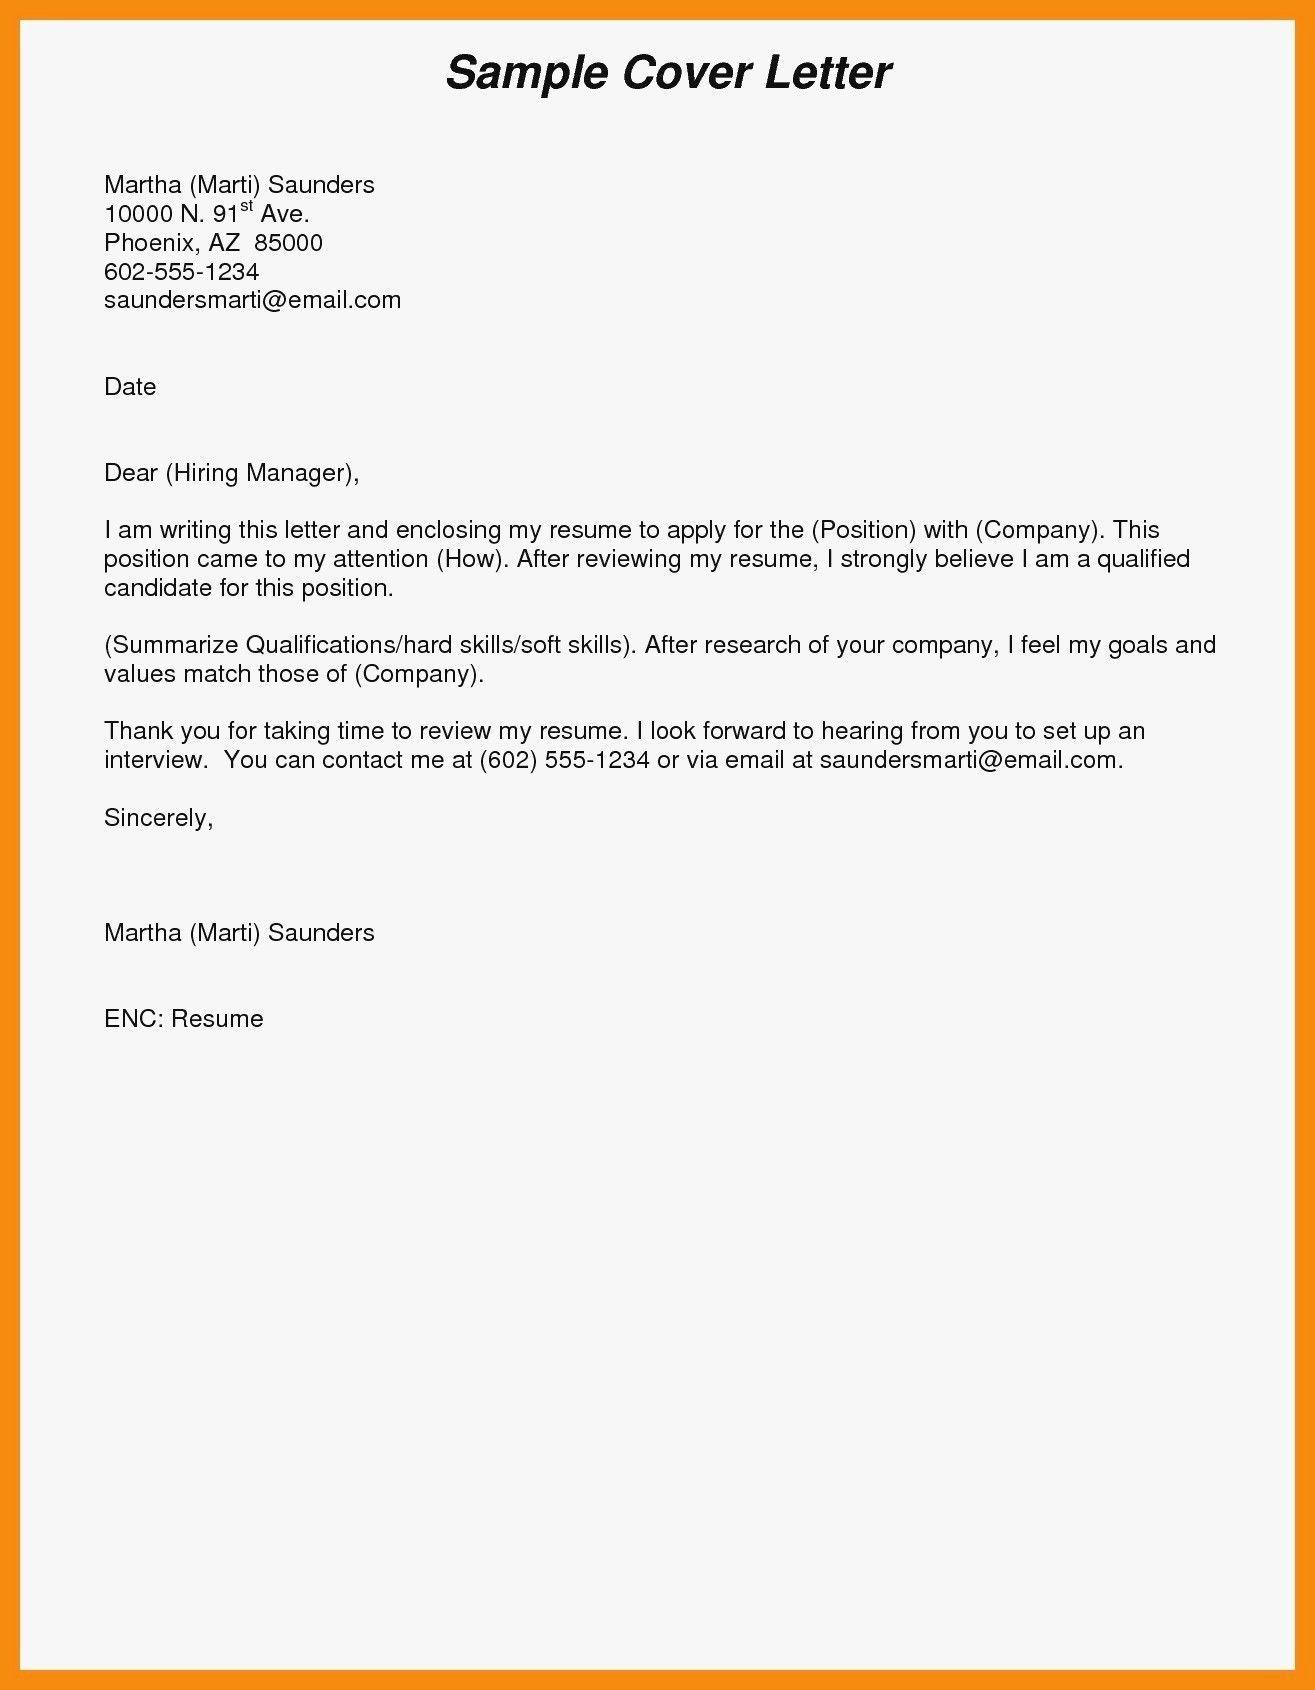 cold call cover letter resume badak.html